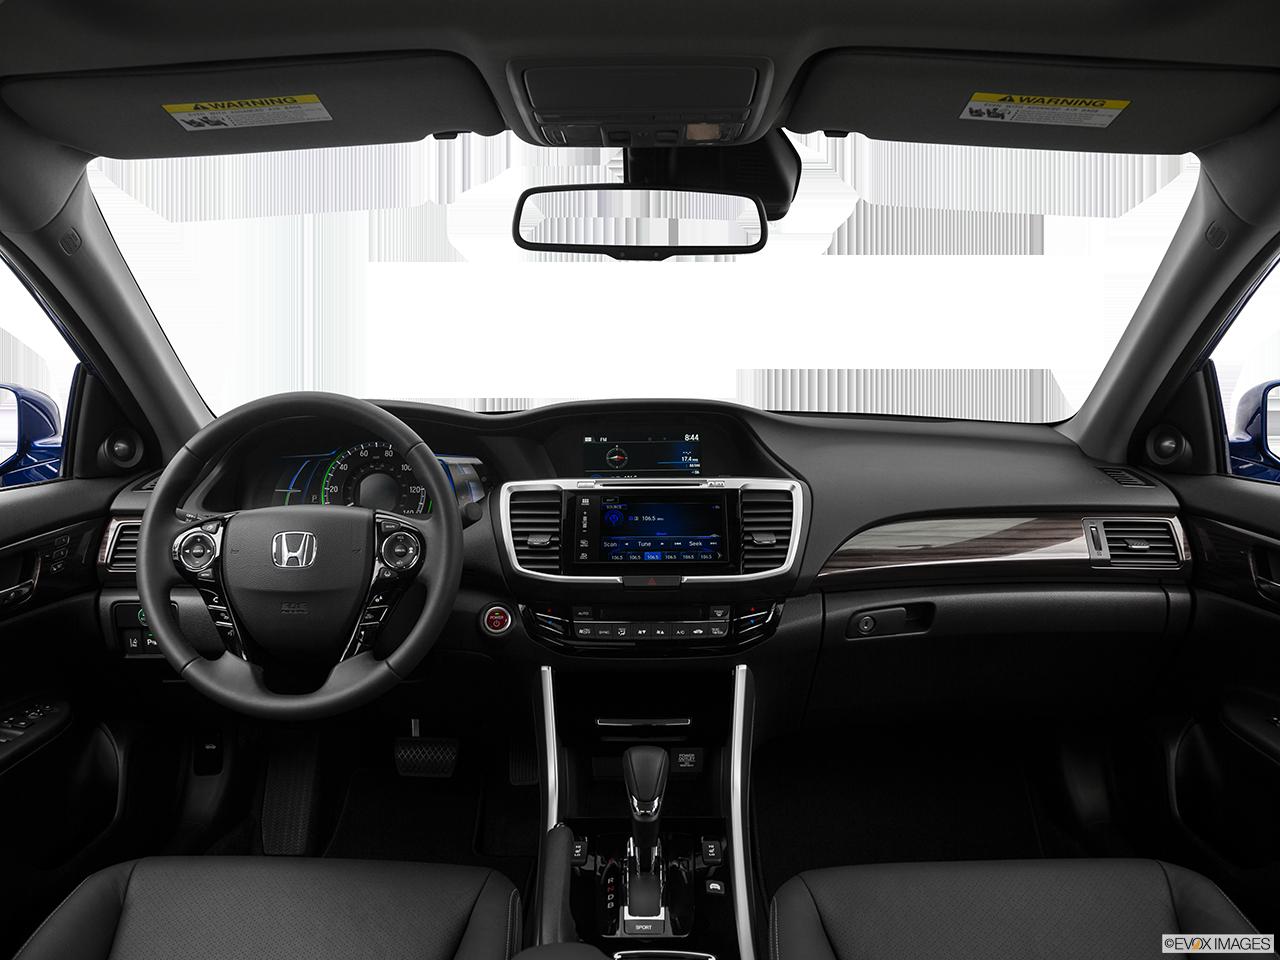 Interior View Of 2017 Honda Accord near San Diego